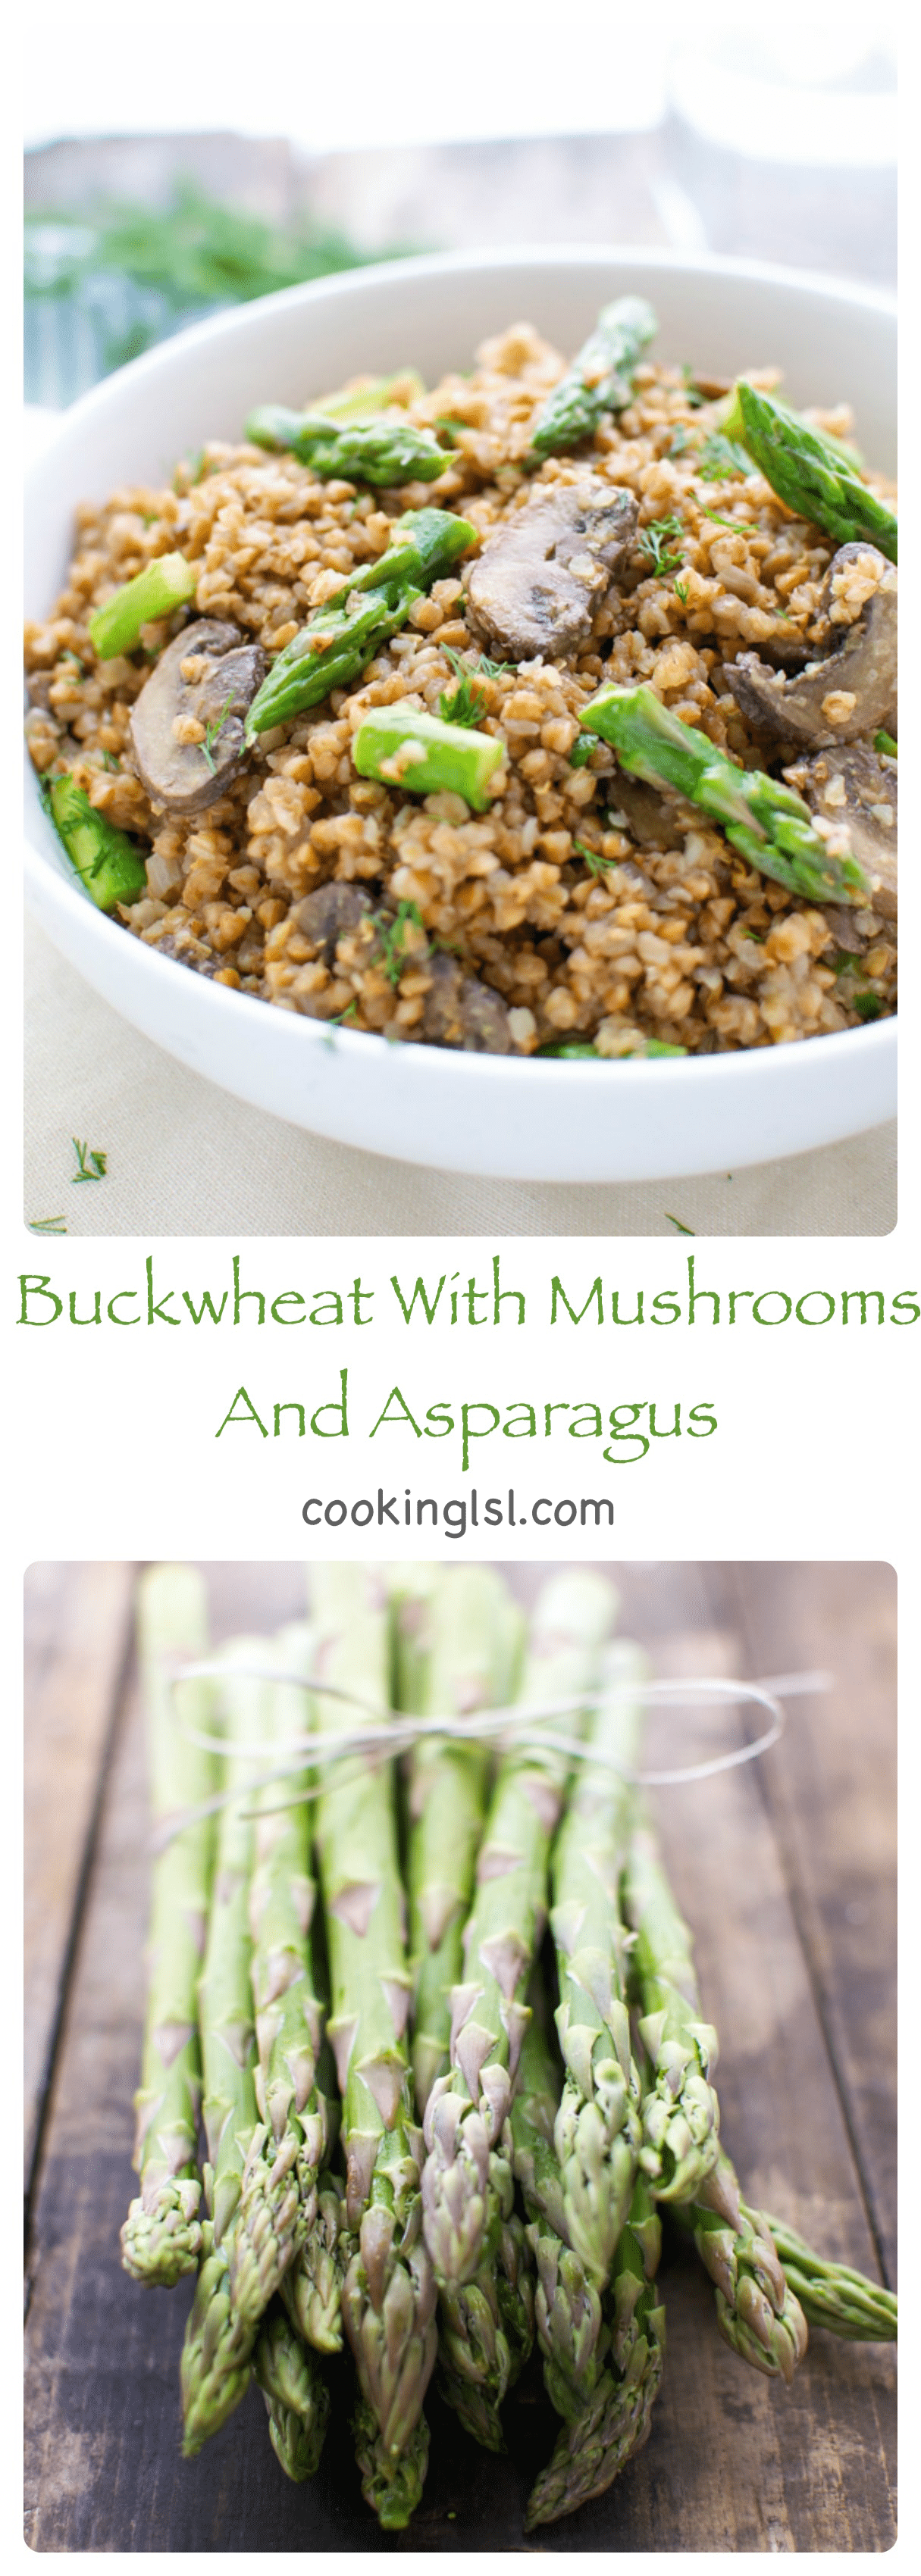 Buckwheat-With-Mushrooms-And-Asparagus